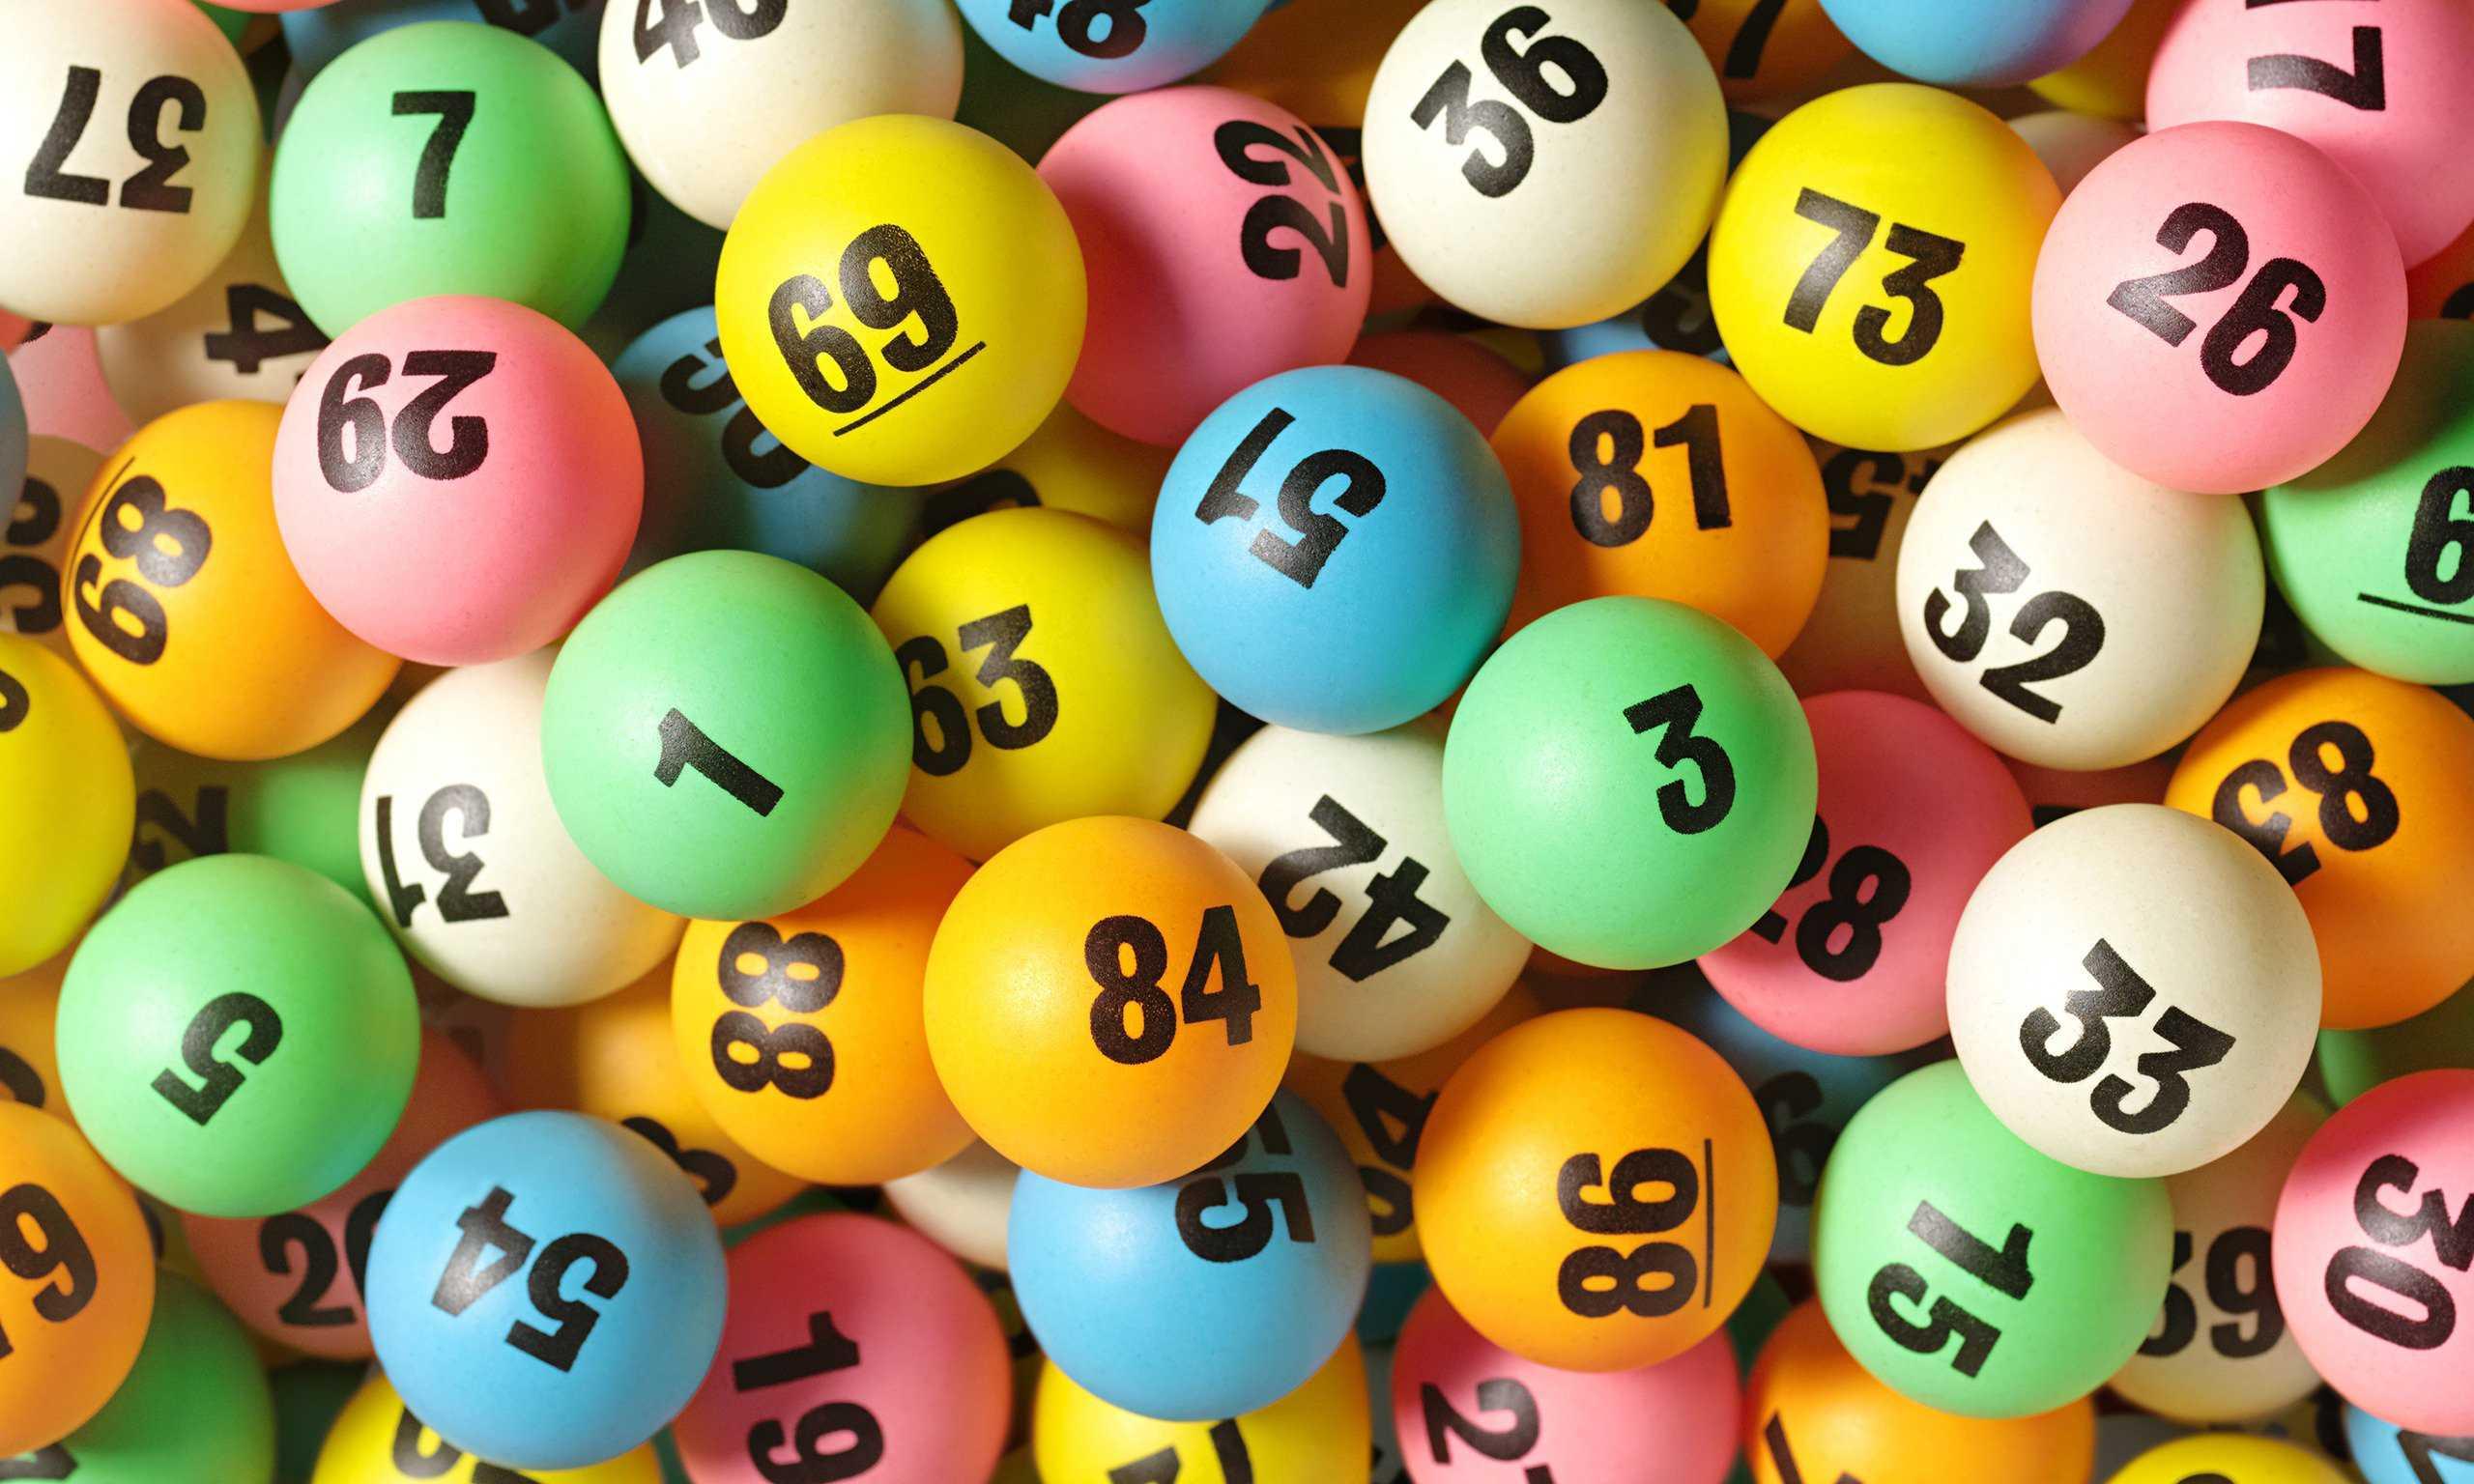 Euromillions de loterie espagnole (5 из 50 + 2 de 12)